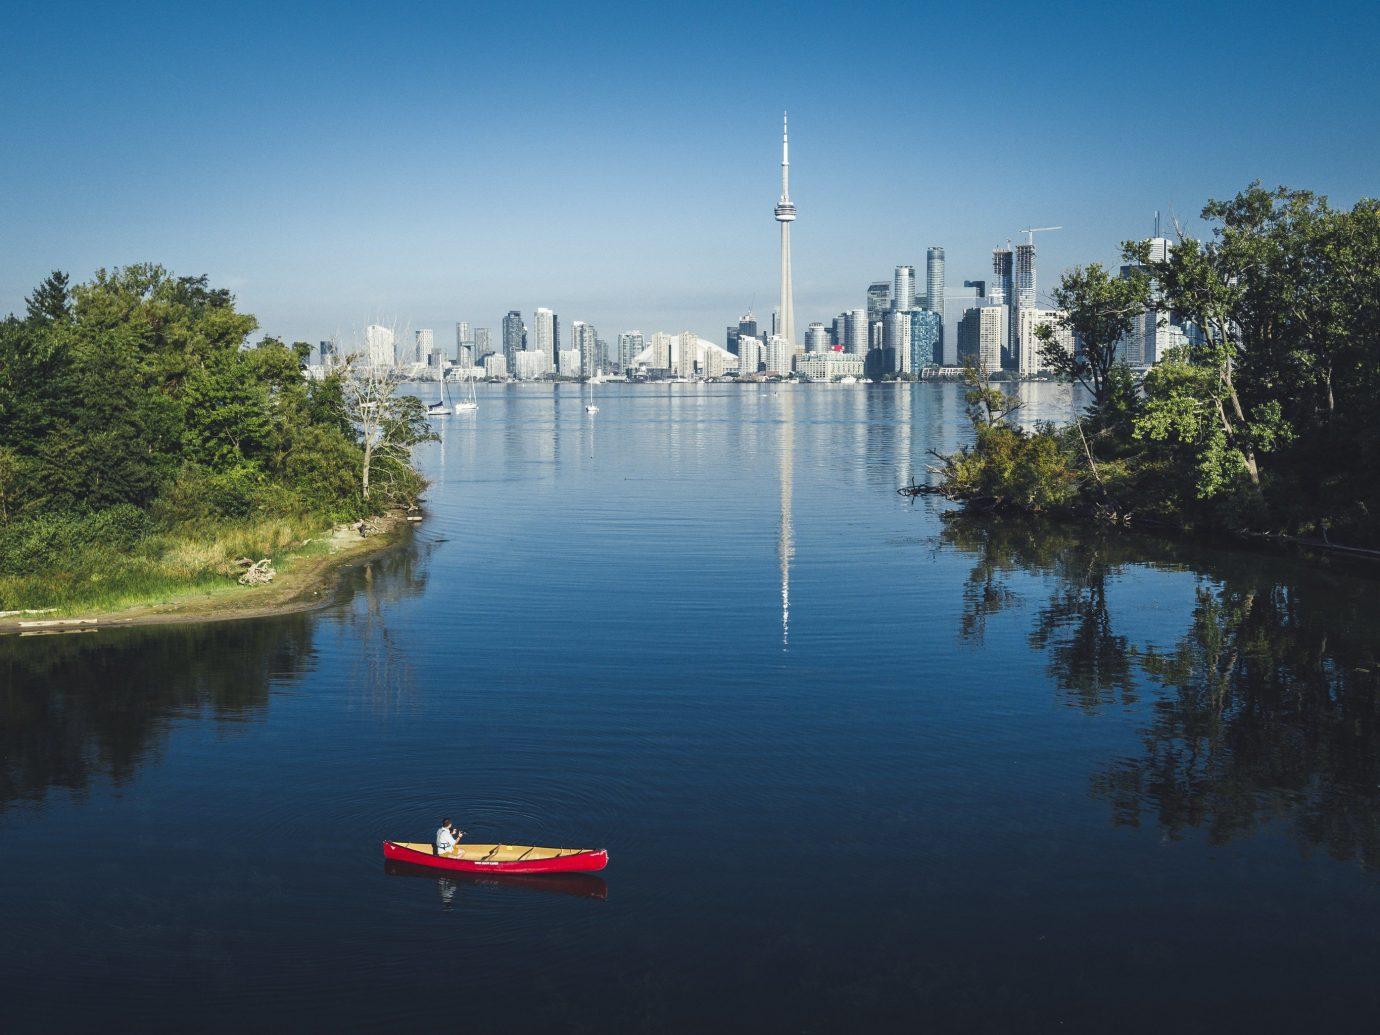 View of the Toronto skyline